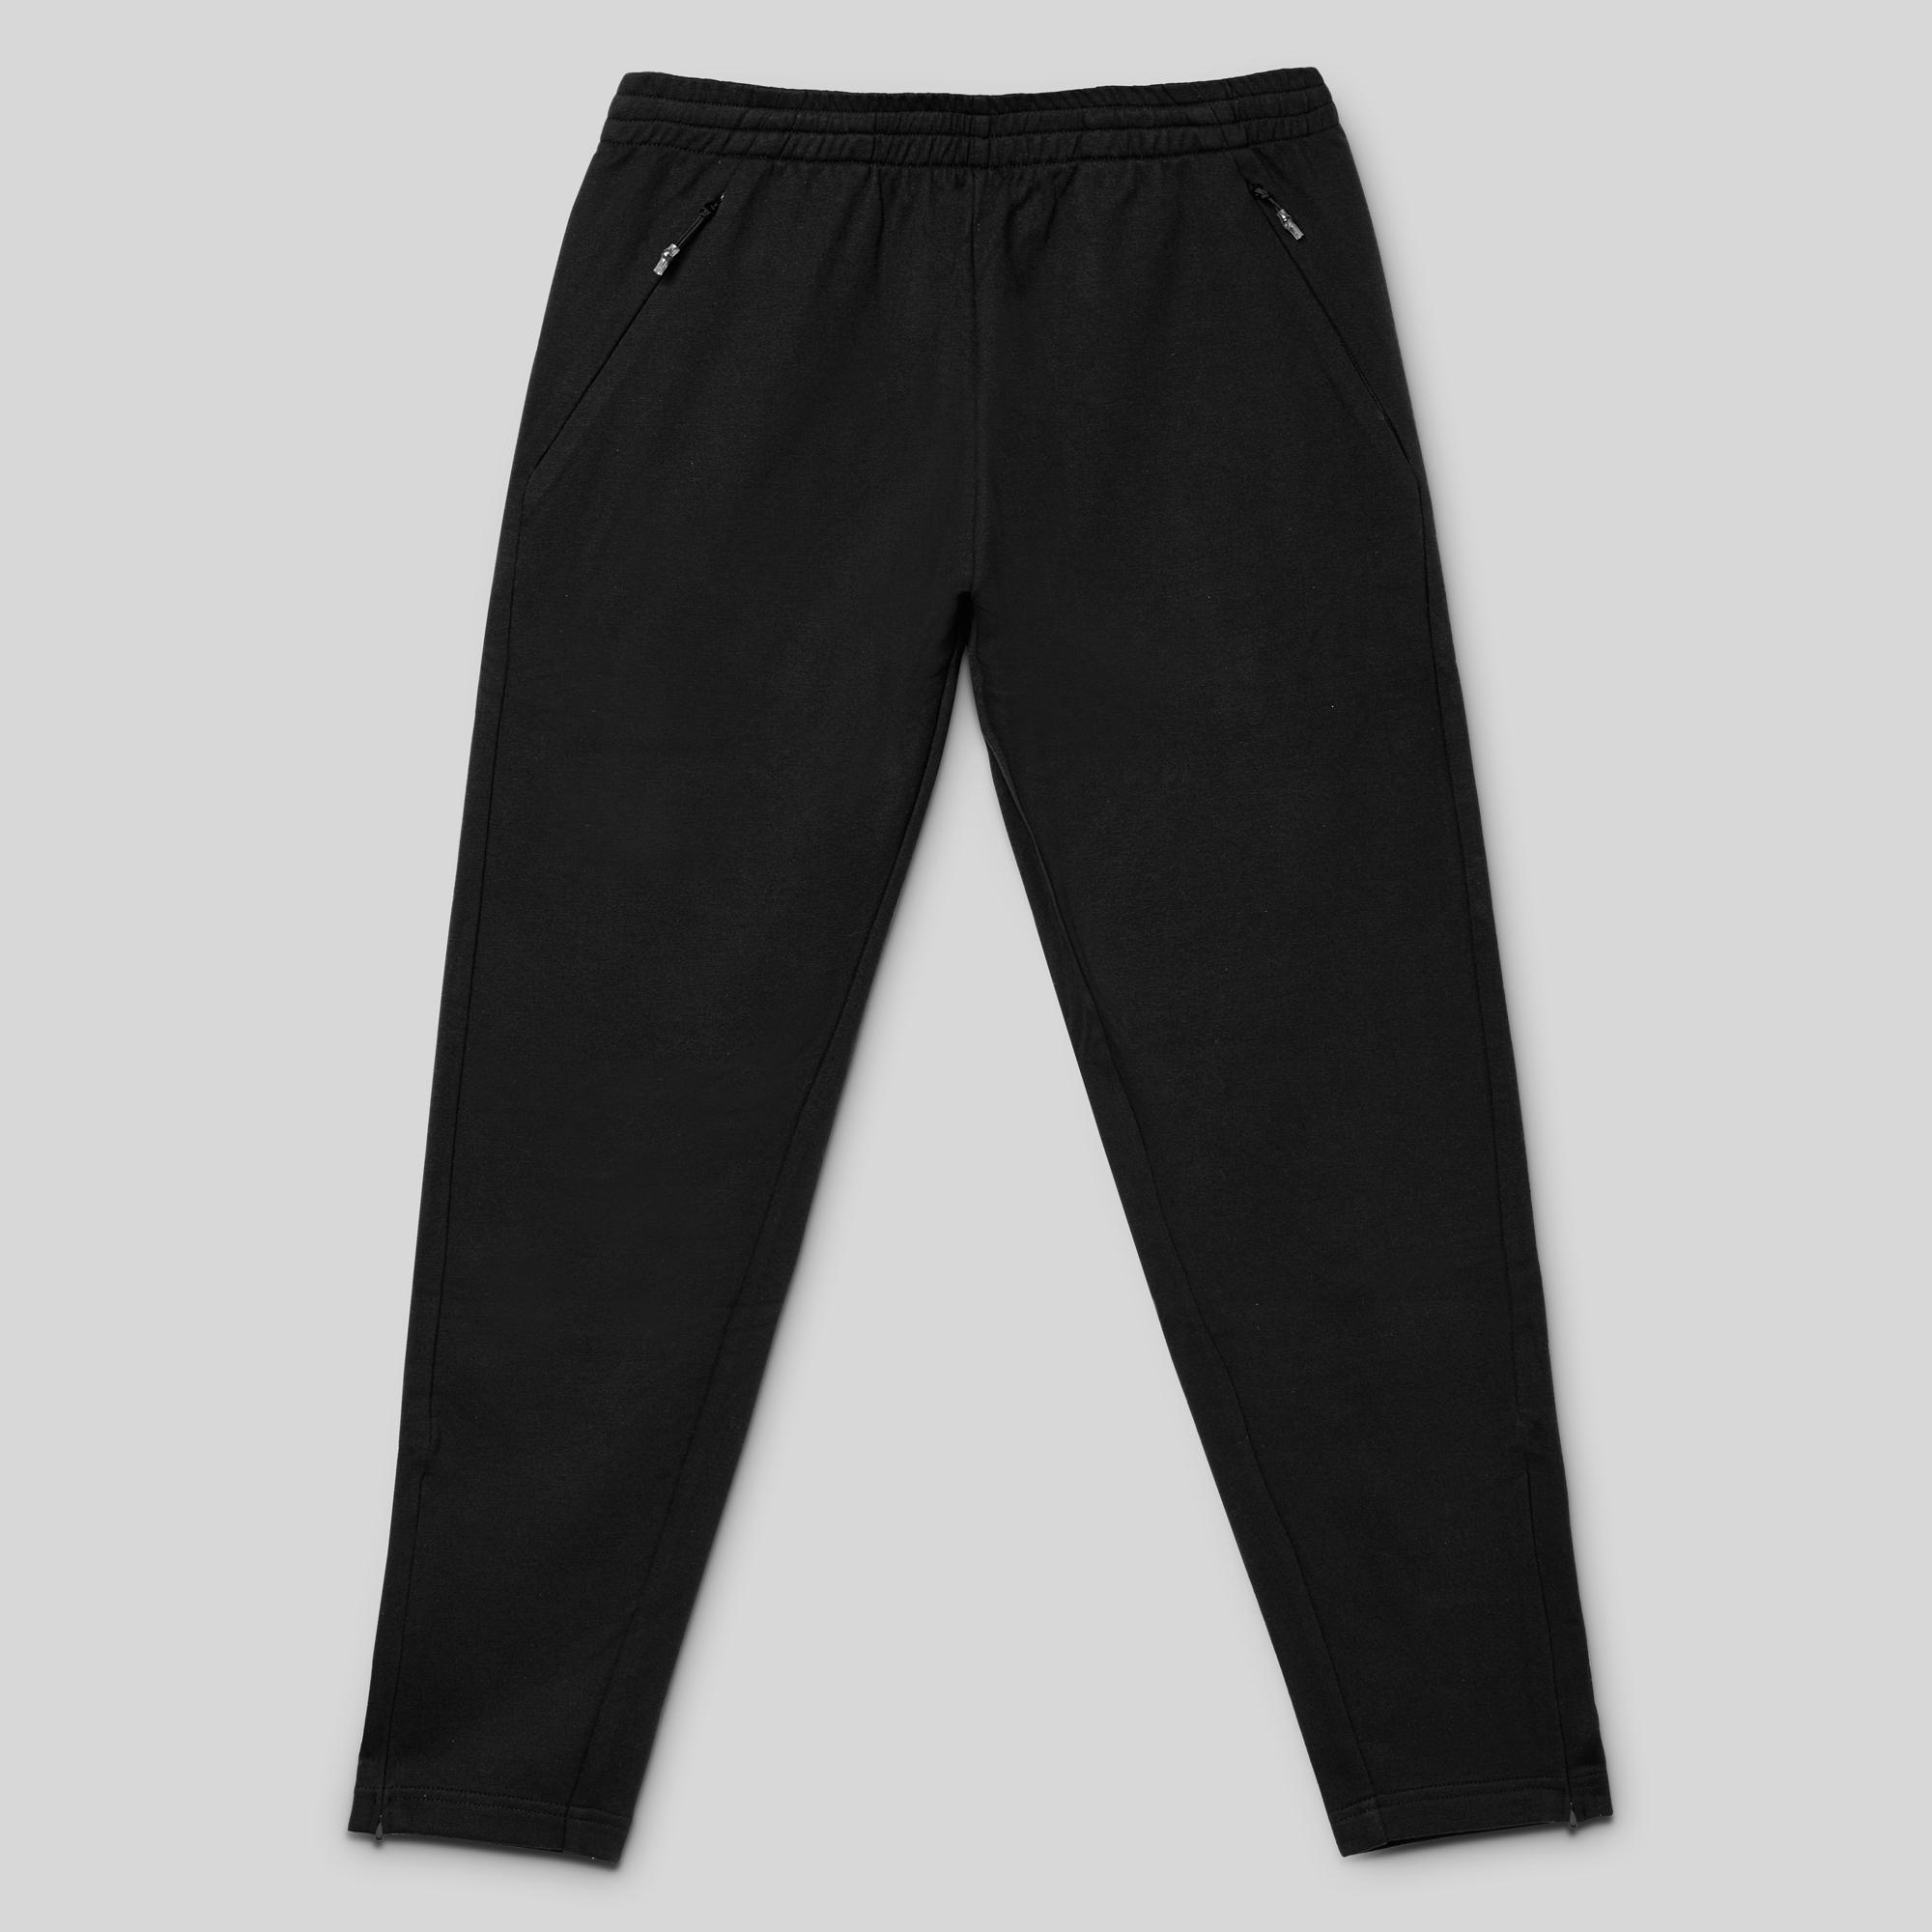 Pantalón largo ROLY Aspen